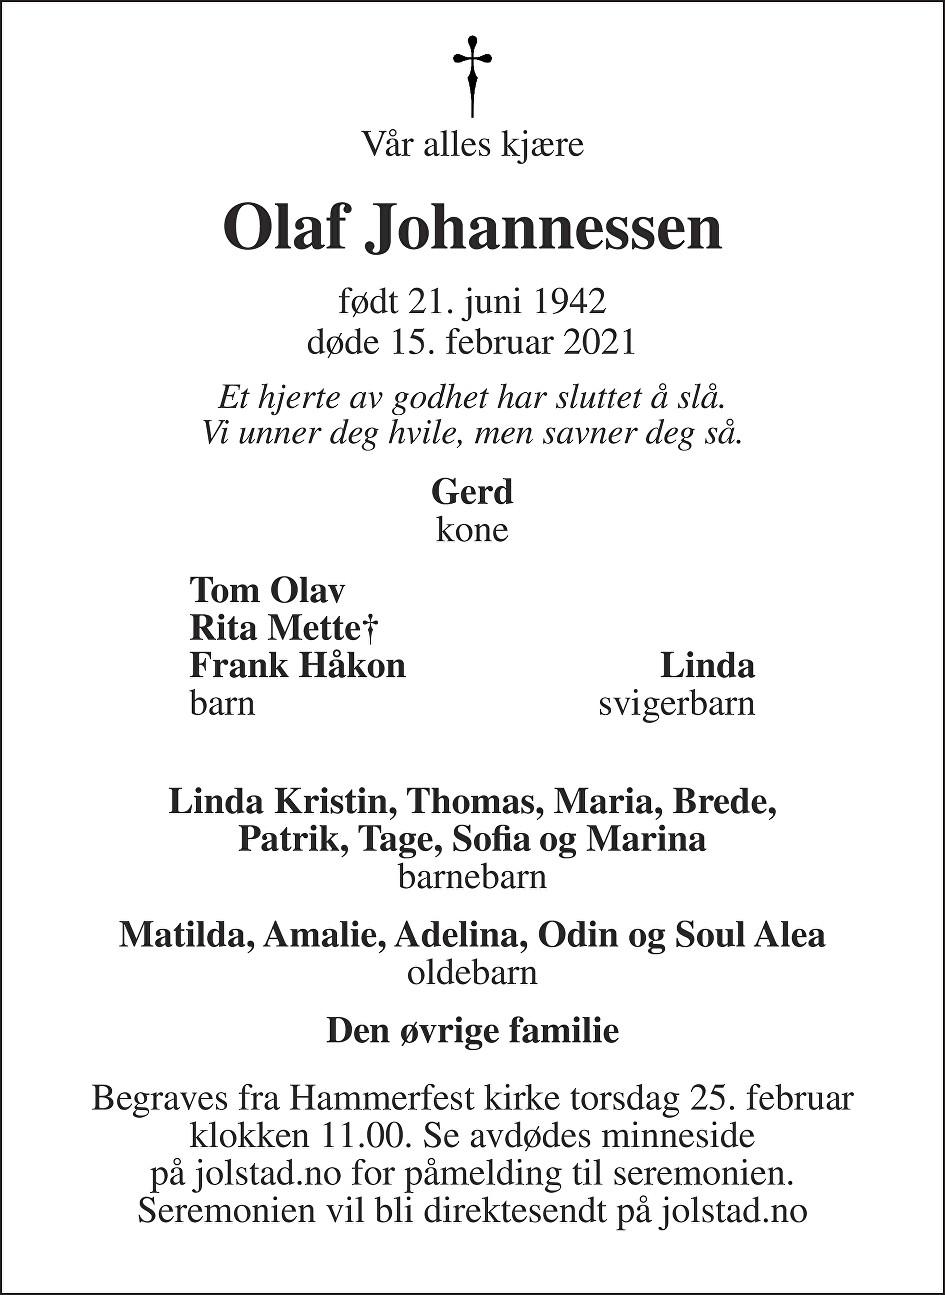 Olaf Johannessen Dødsannonse